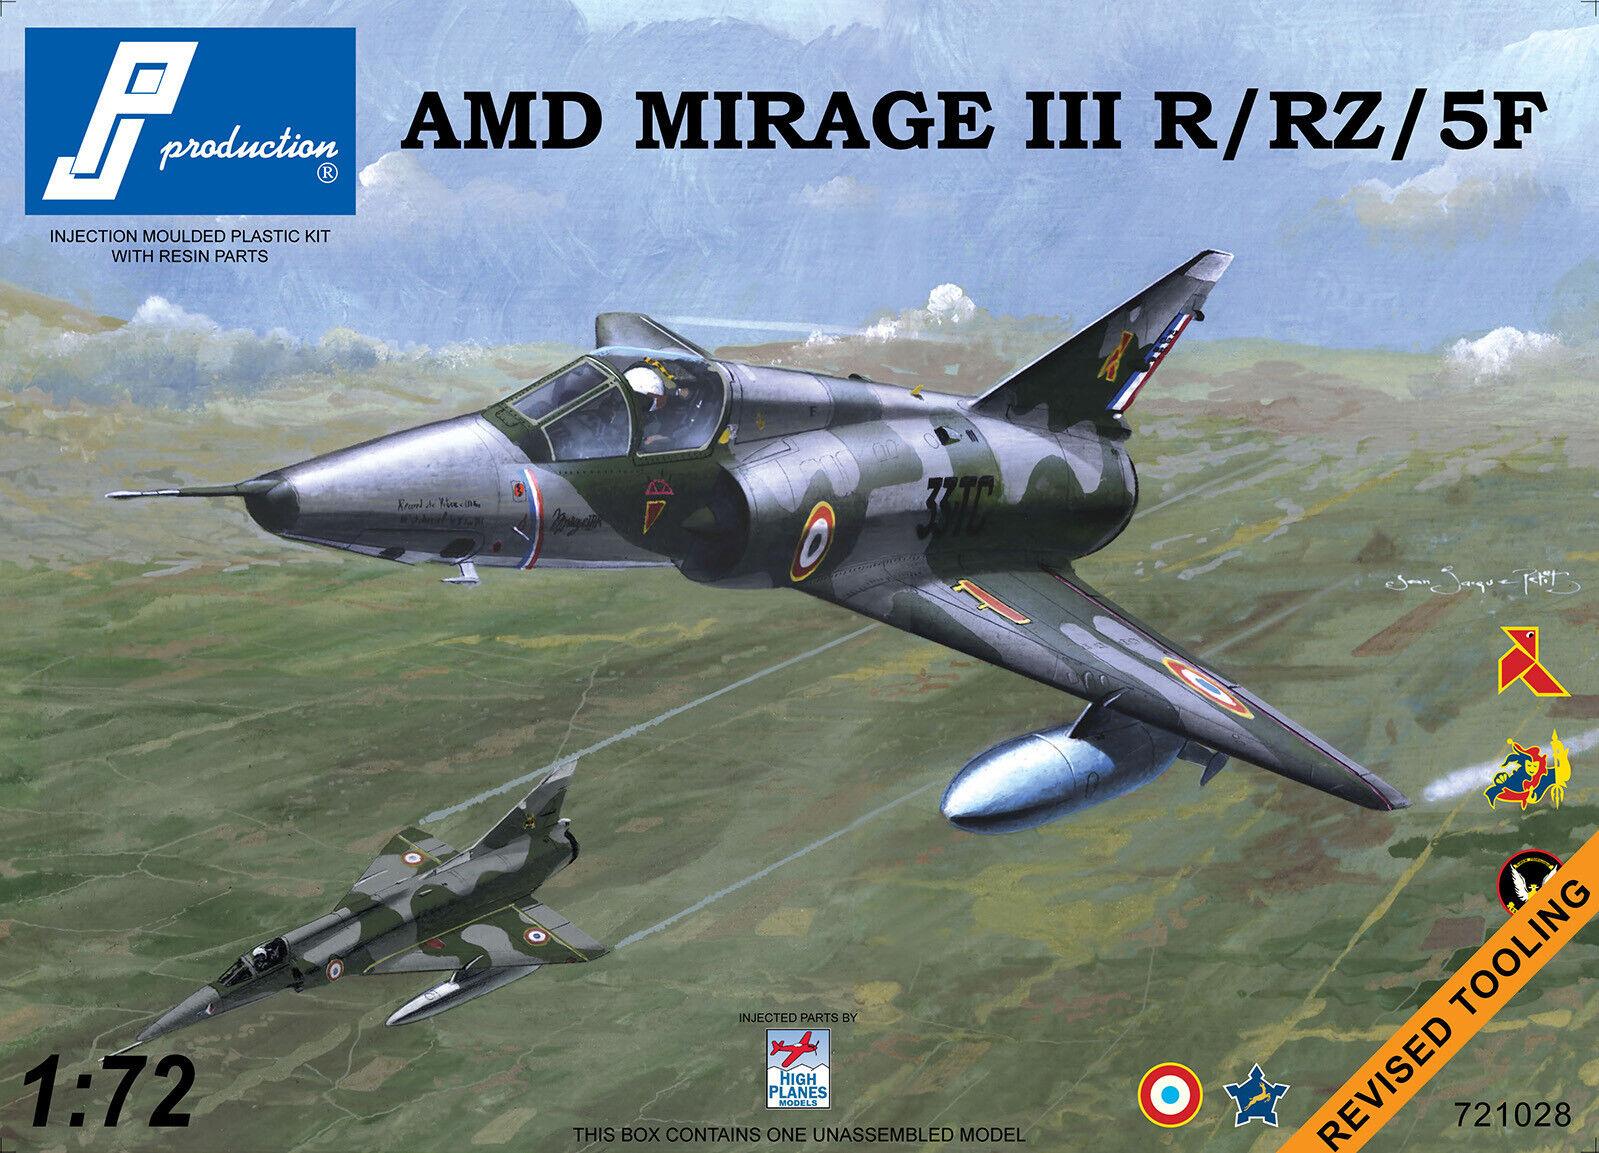 acquisti online Pj Productions 1 72 Dassault Mirage Iiir     5f  721028  alta quaità